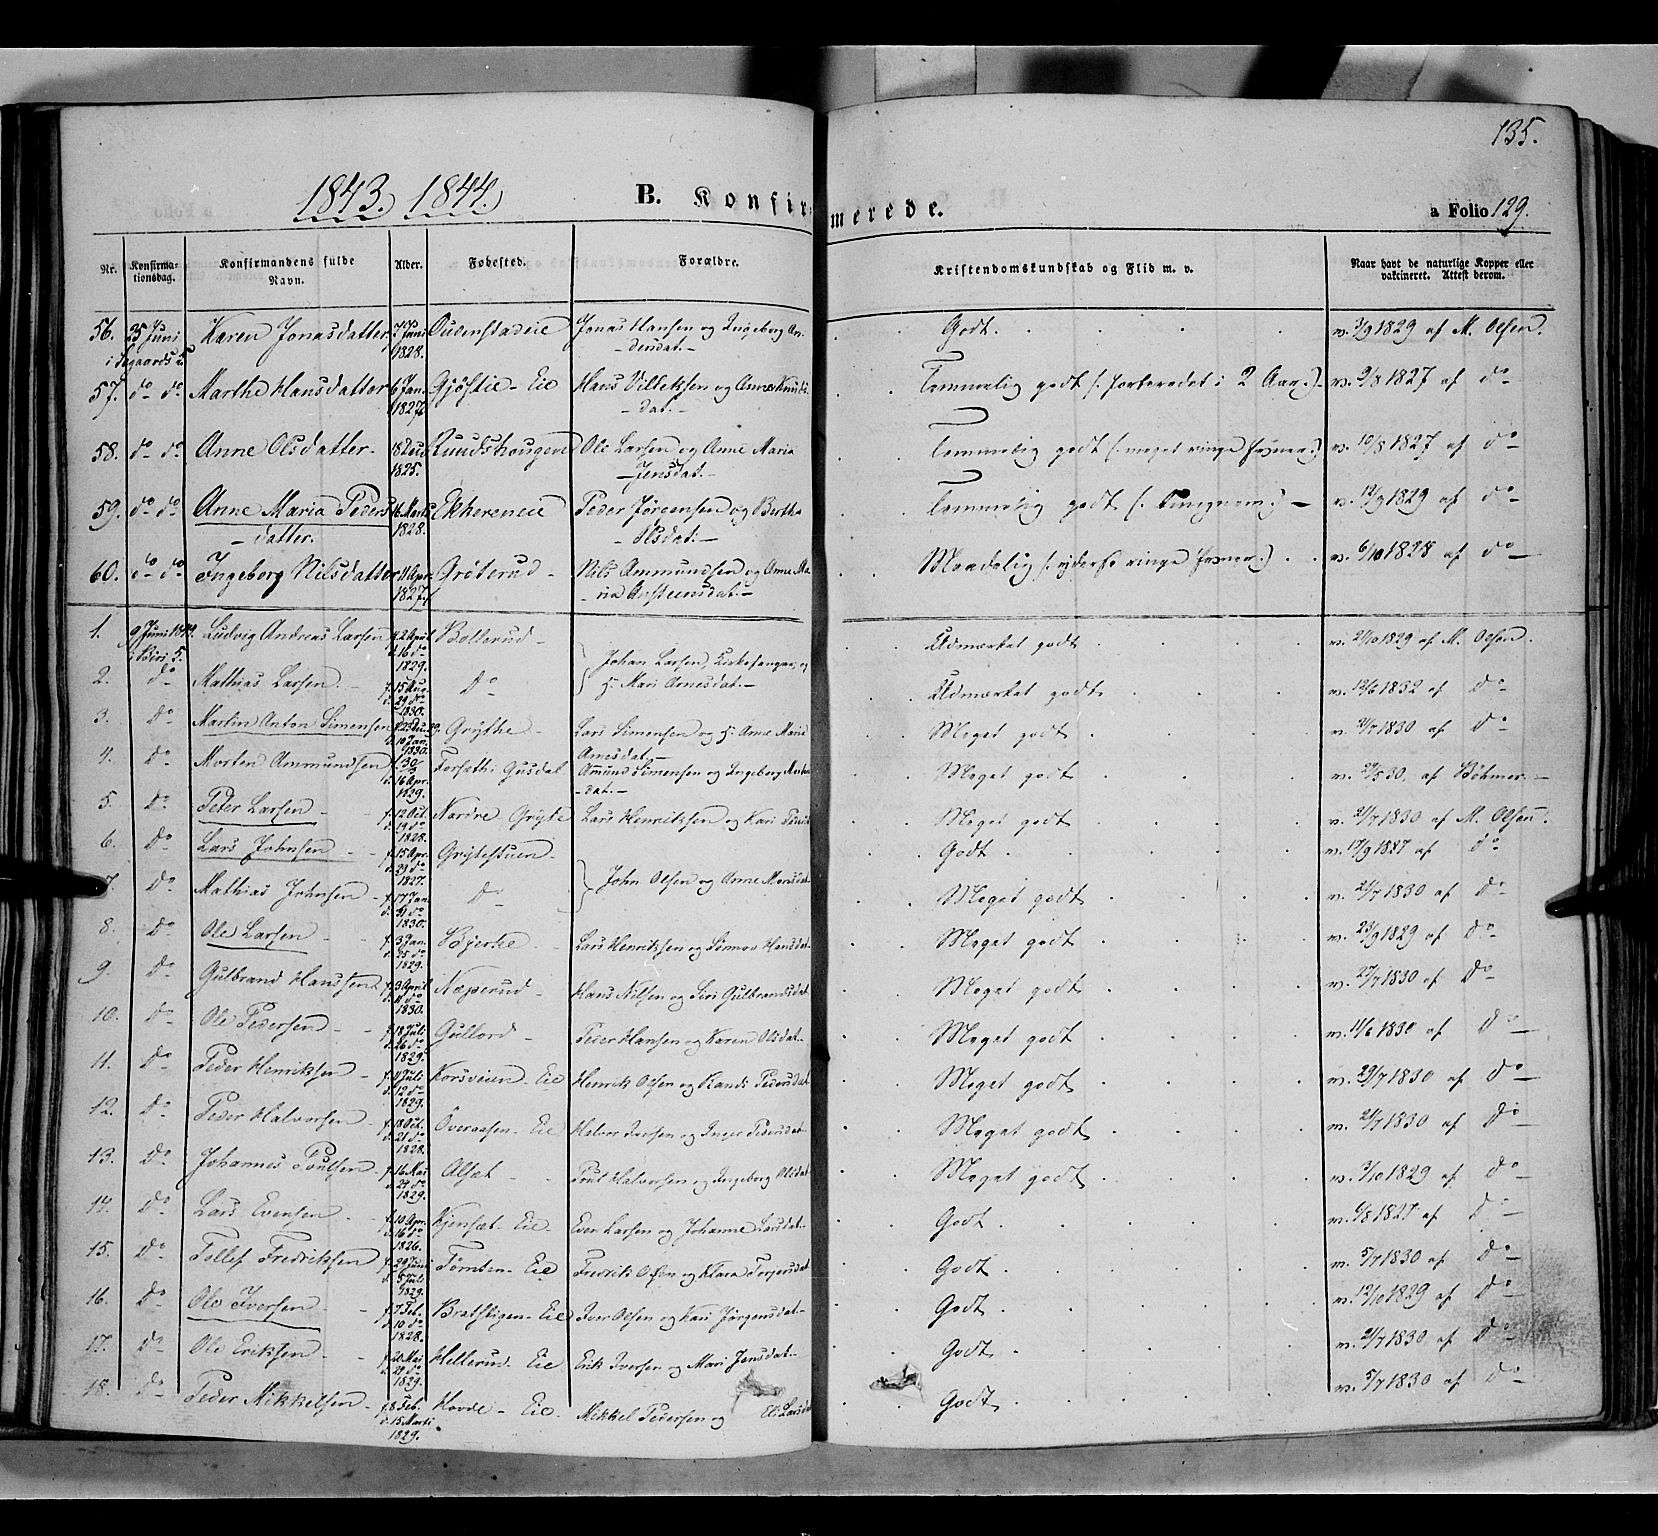 SAH, Biri prestekontor, Ministerialbok nr. 5, 1843-1854, s. 135